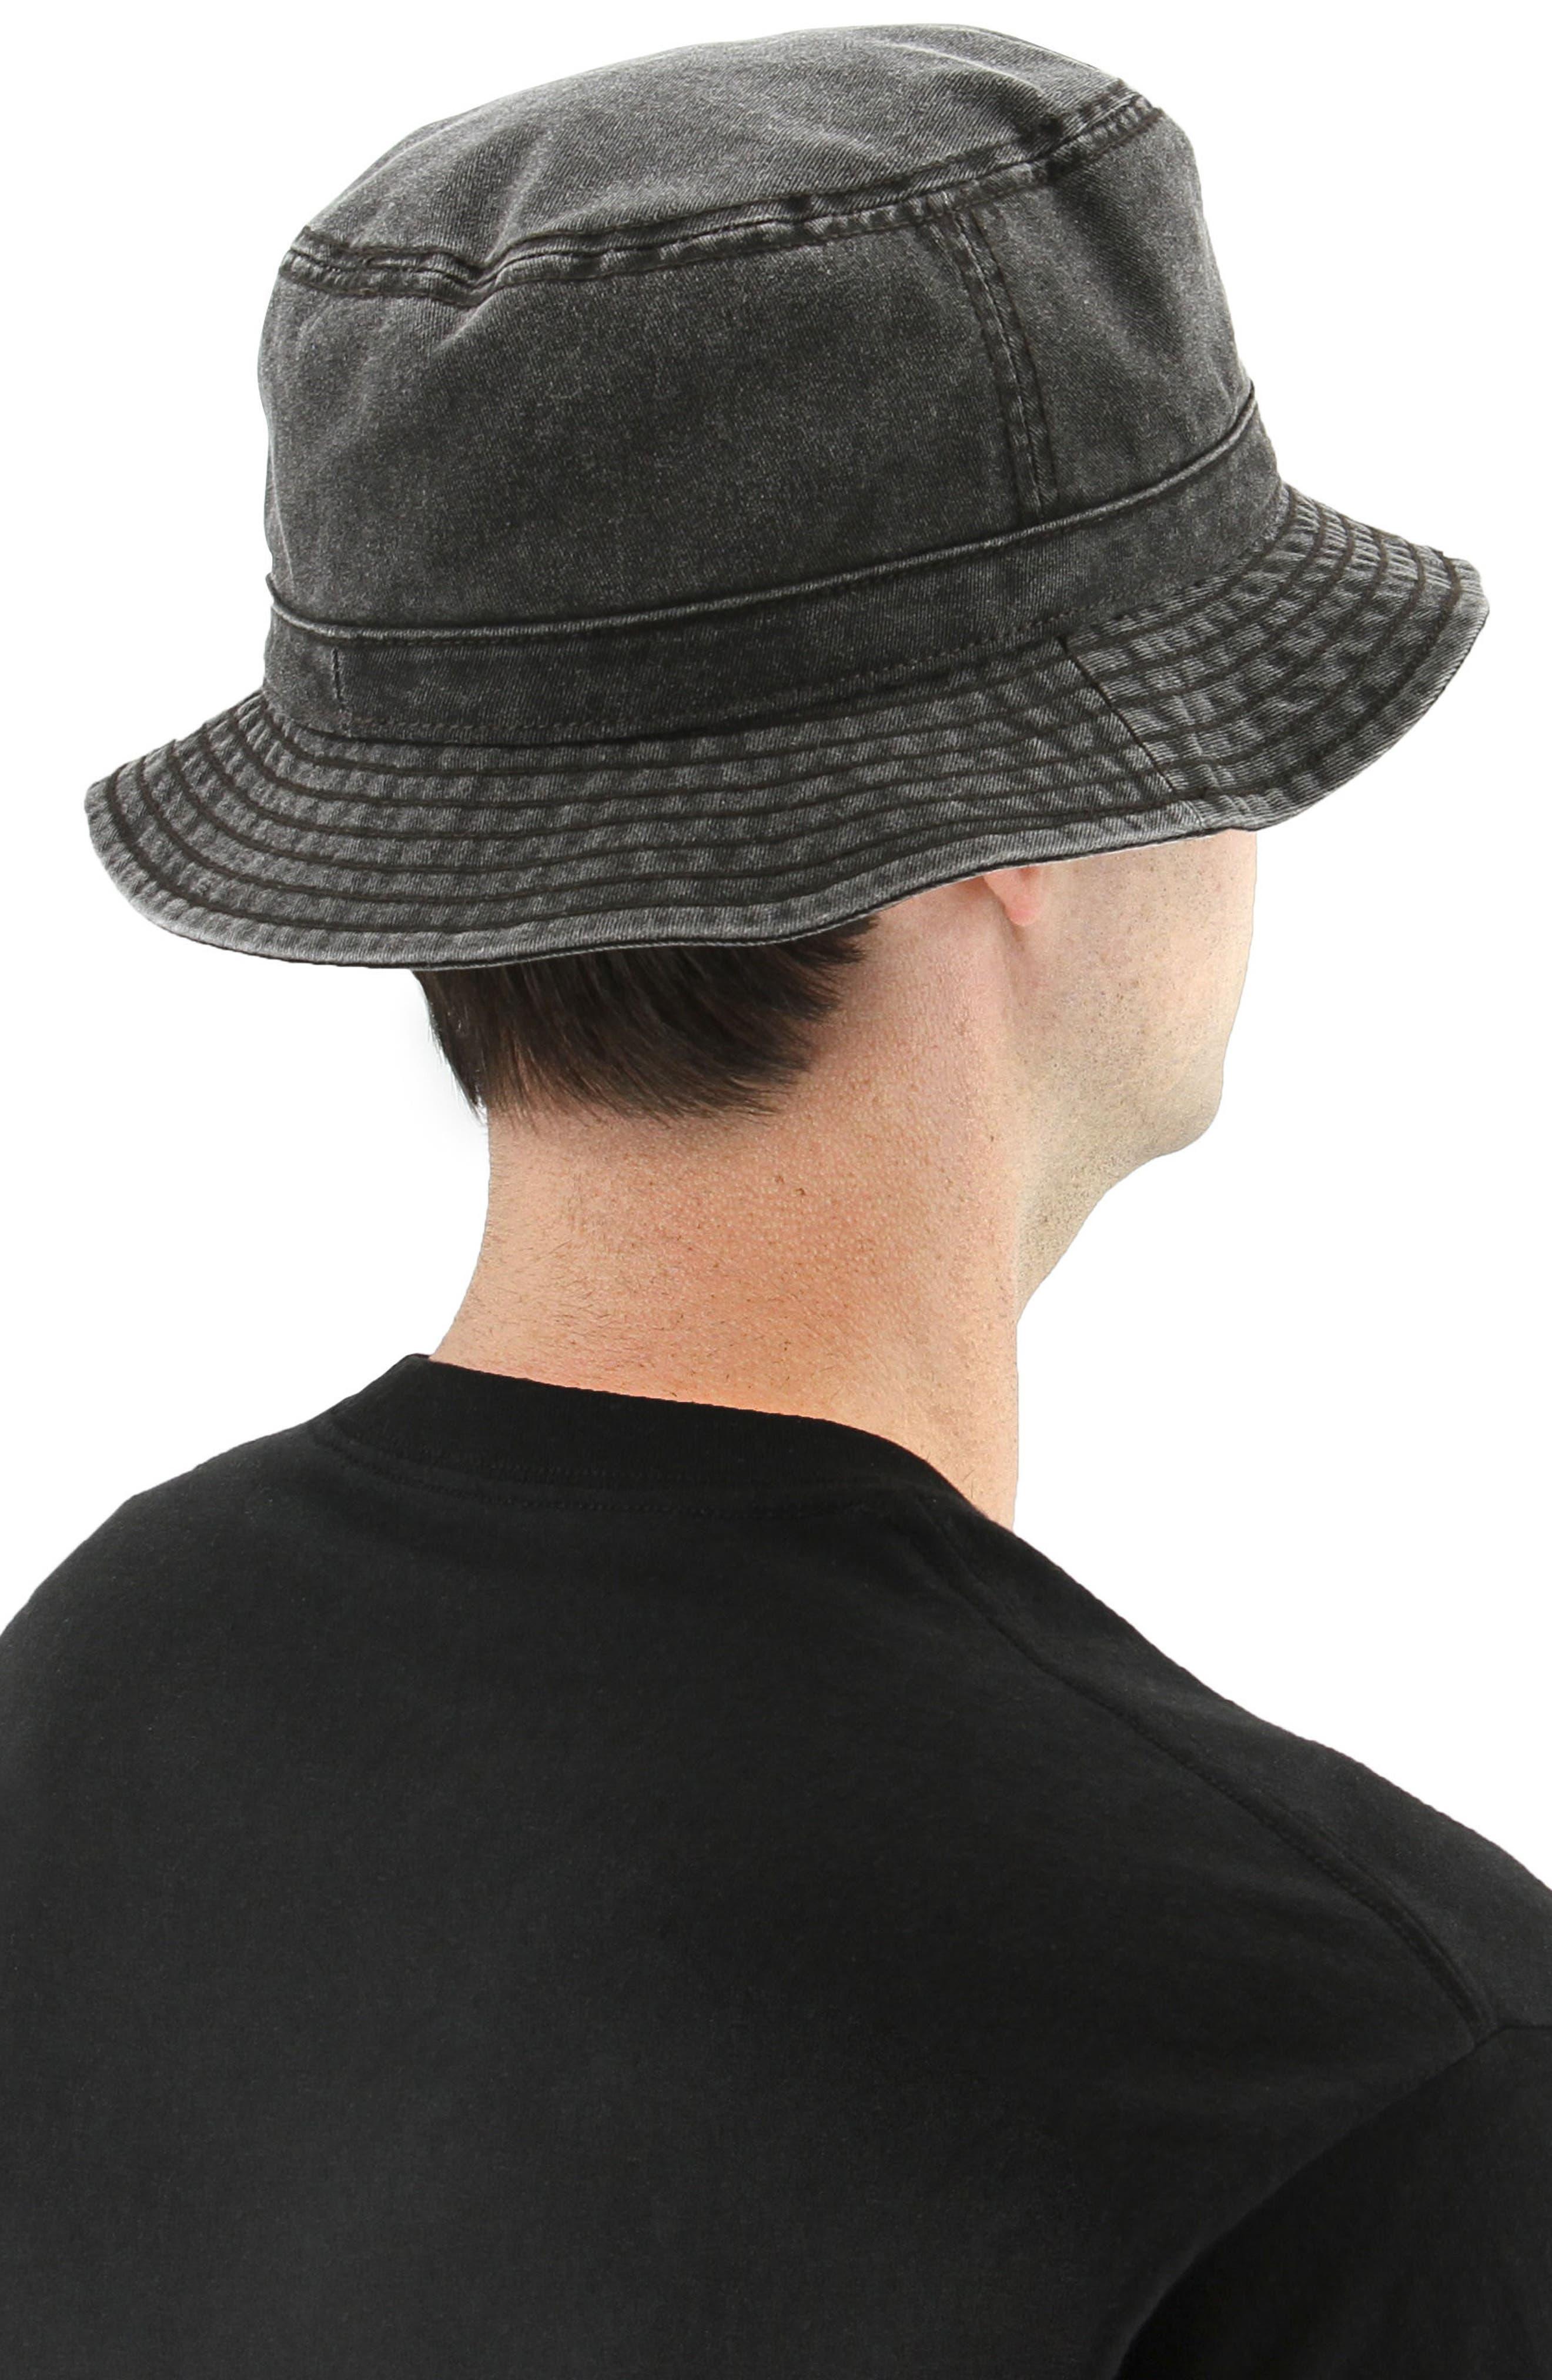 Washed Bucket Hat,                             Alternate thumbnail 3, color,                             Black/ Black